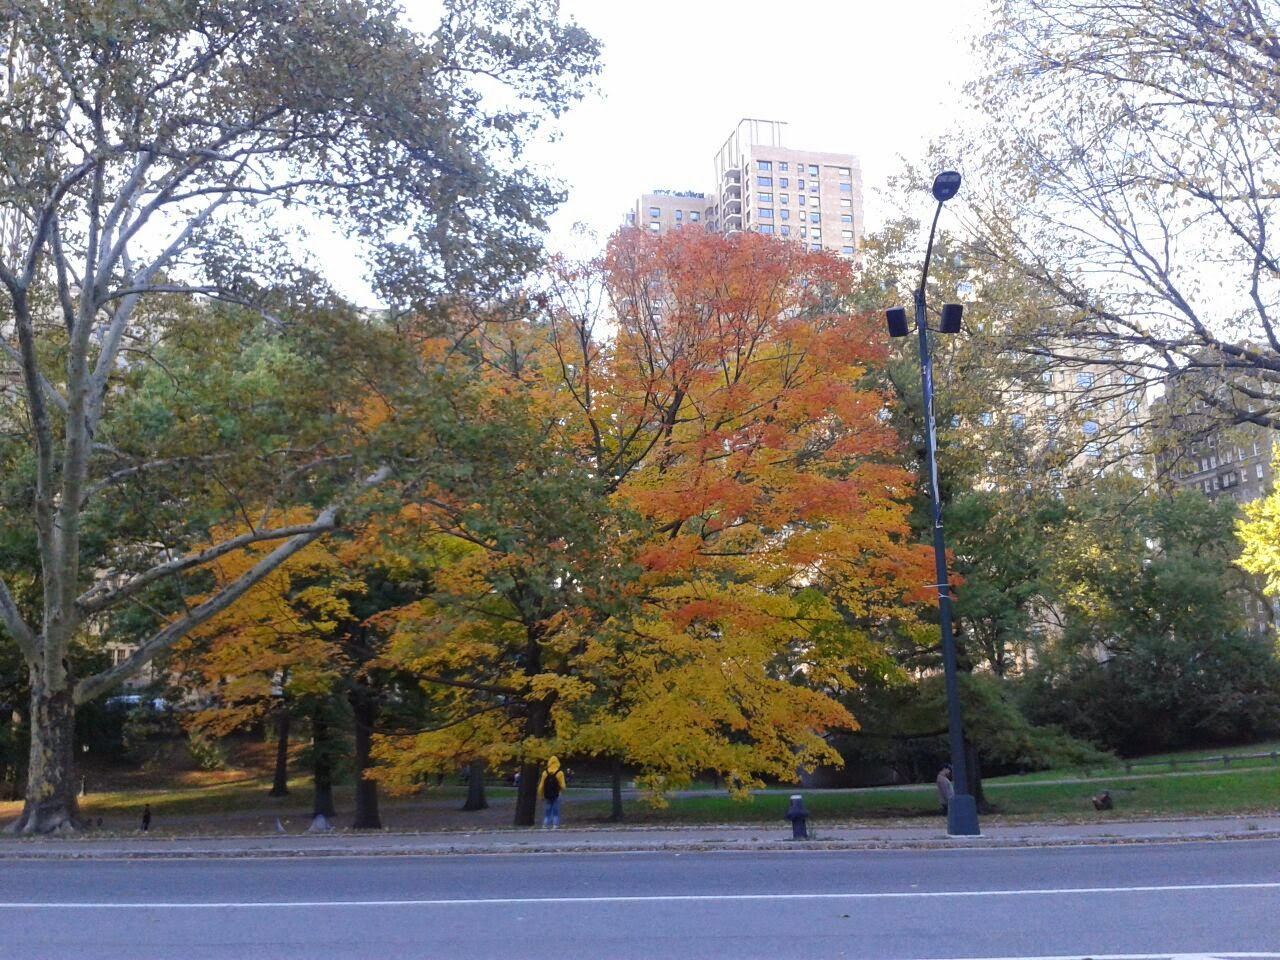 imagen de Árbol dorado de otoño, Centra Park